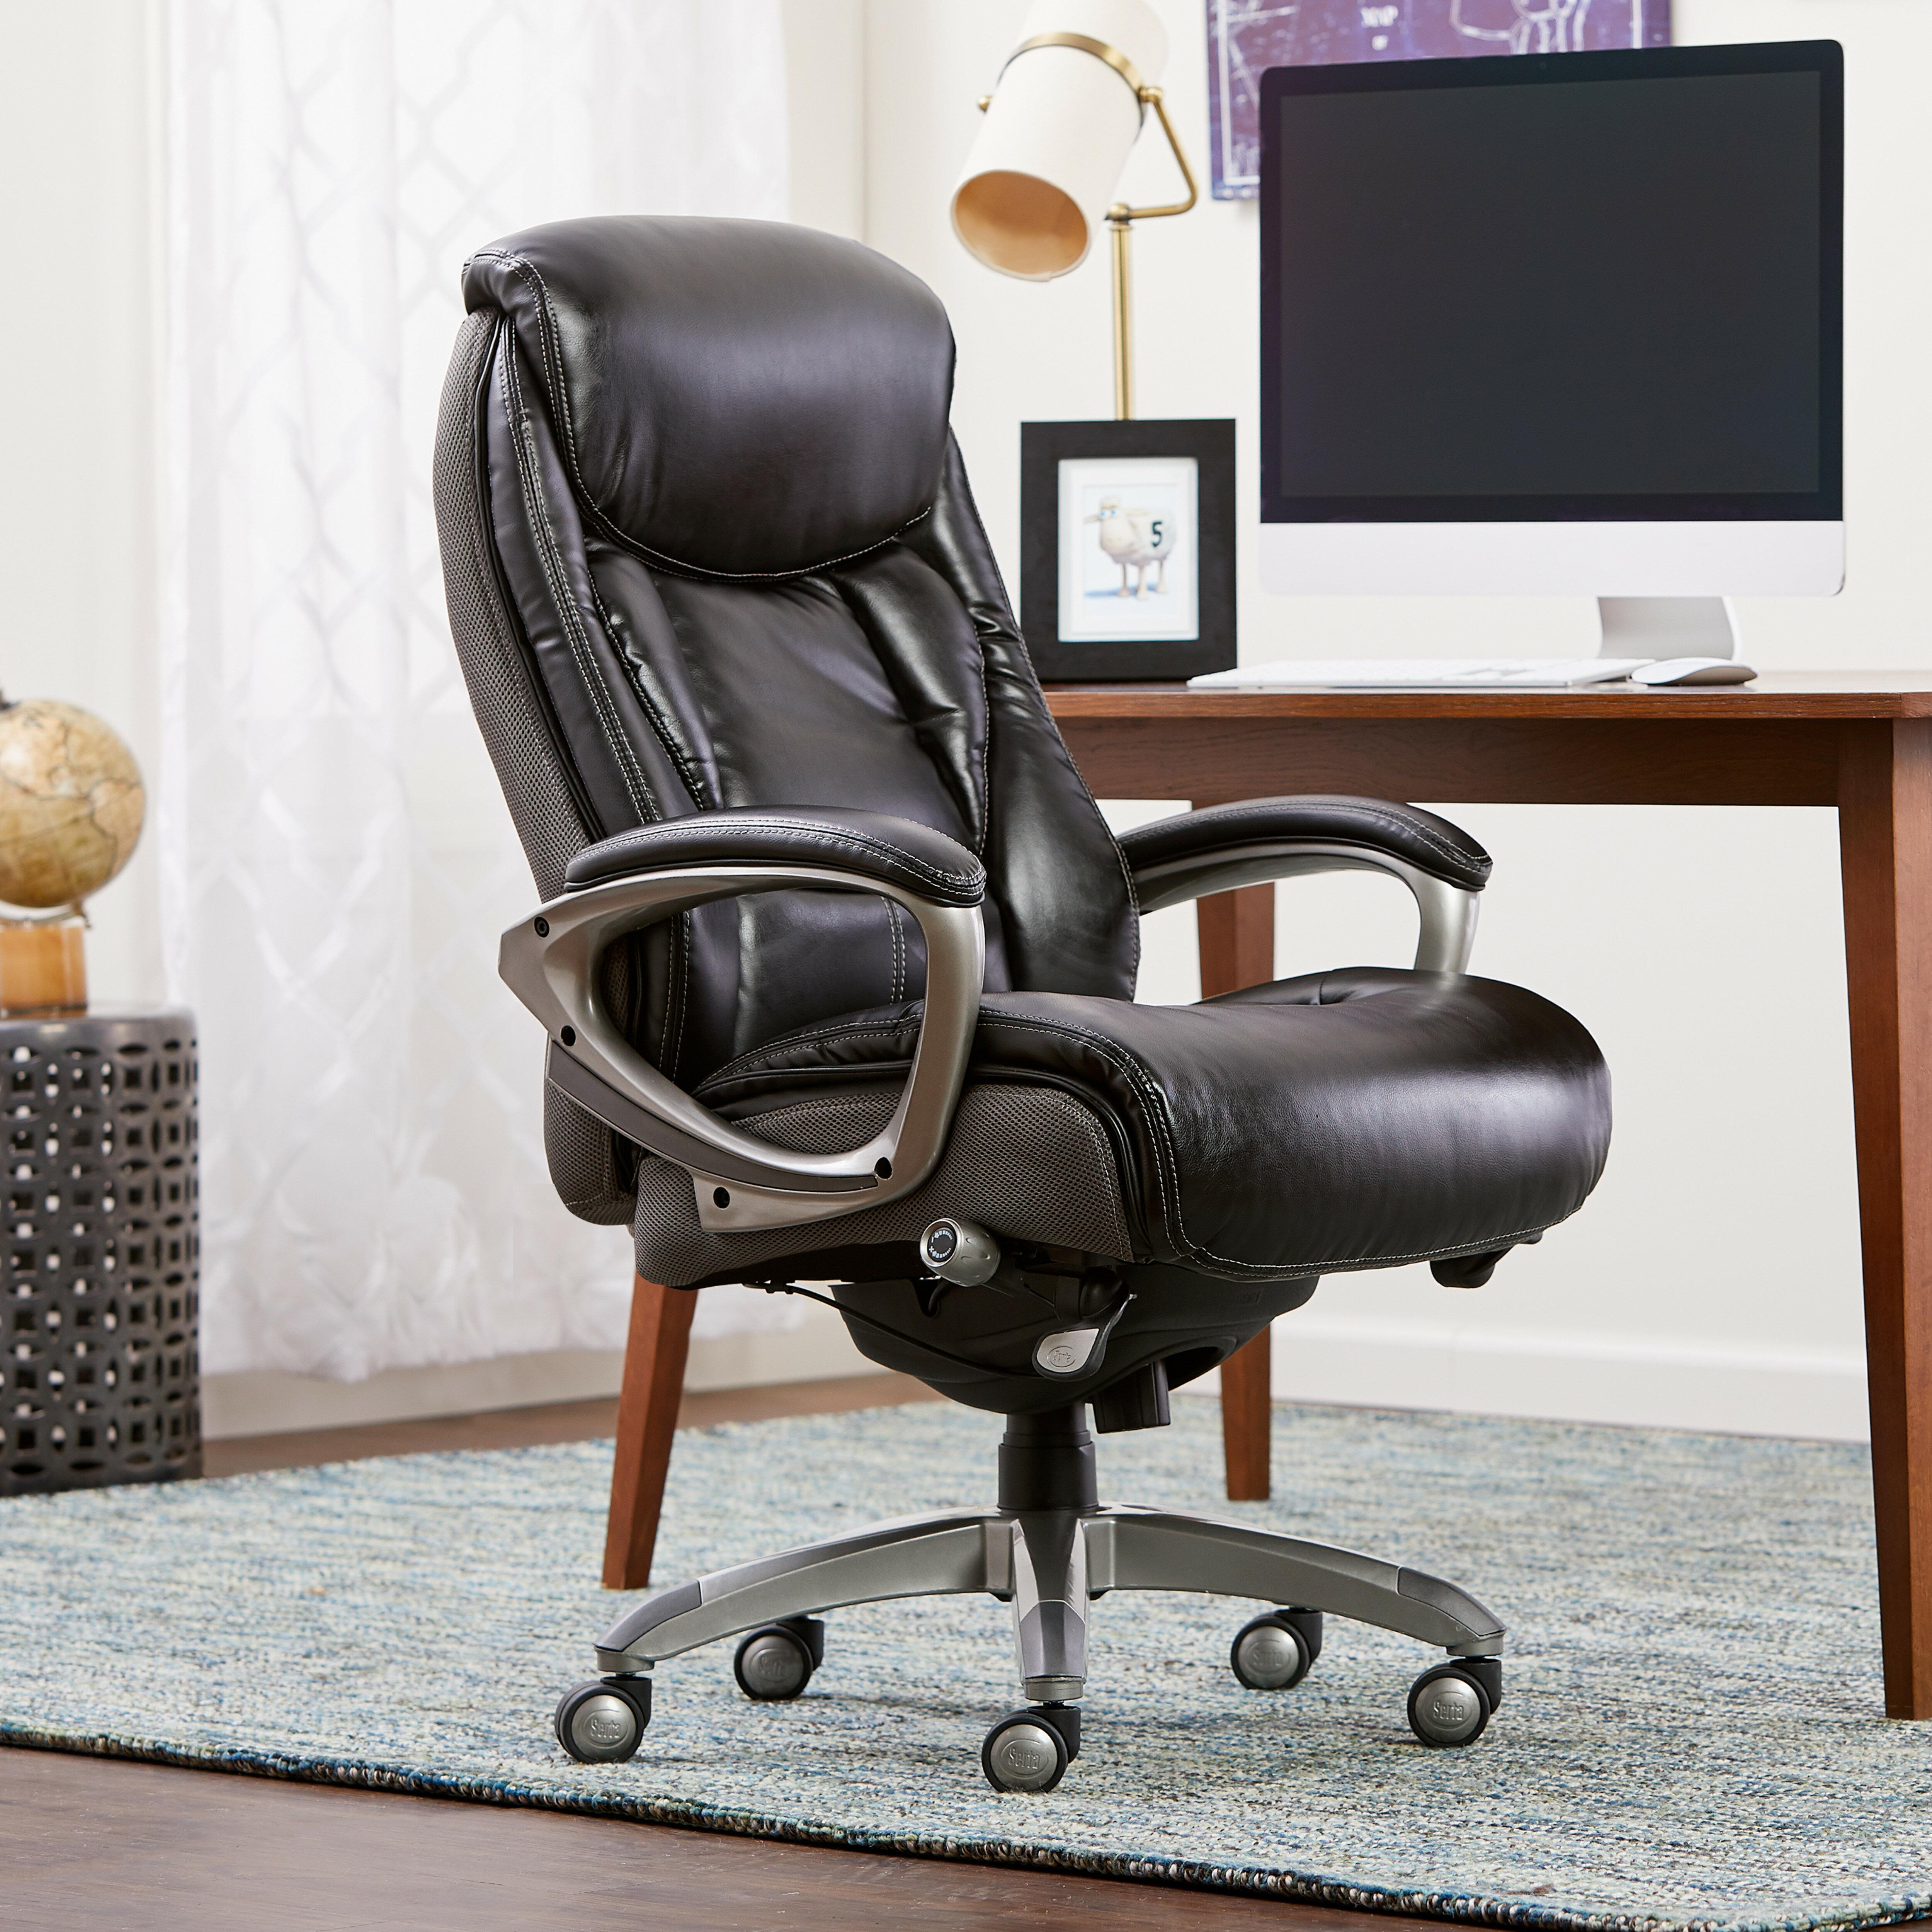 Serta At Home Tranquility Executive Chair Reviews Wayfair